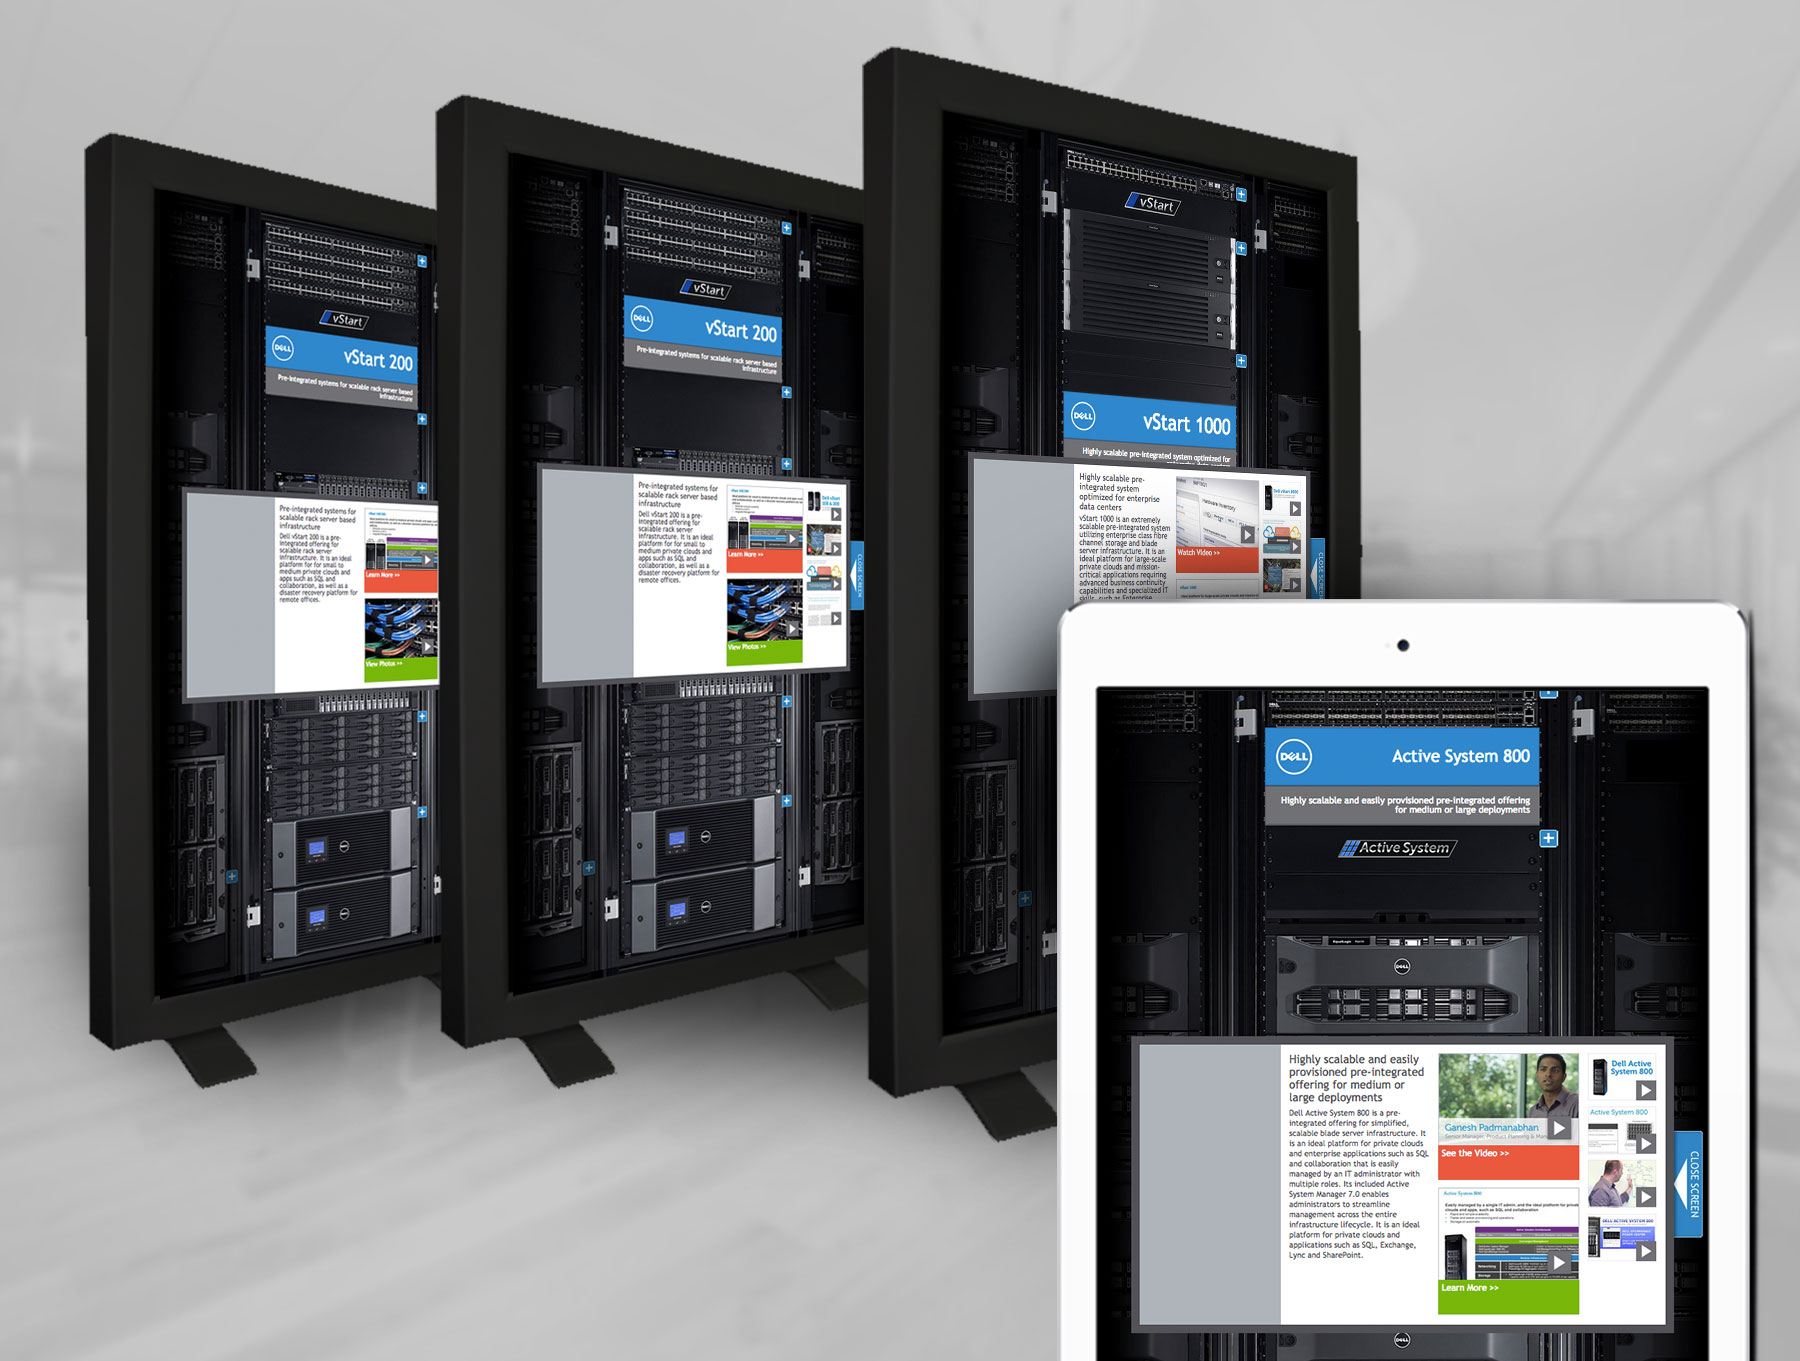 Dell server rack web design